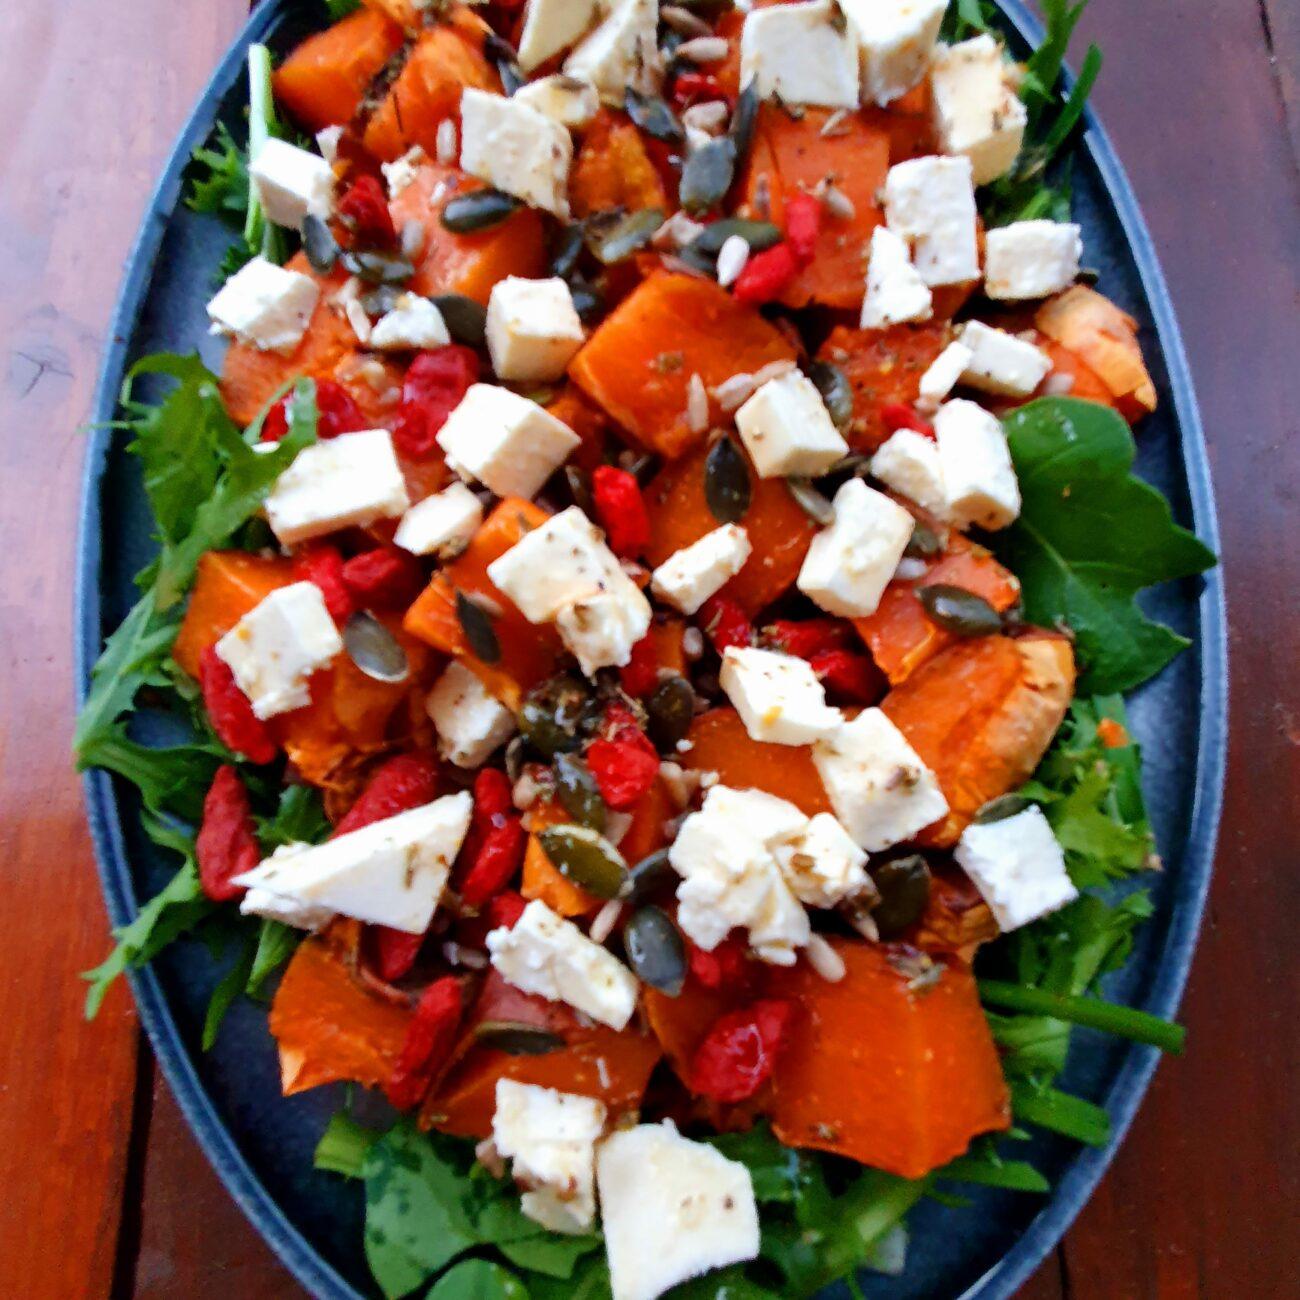 Rocket and Sweet Potato Salad